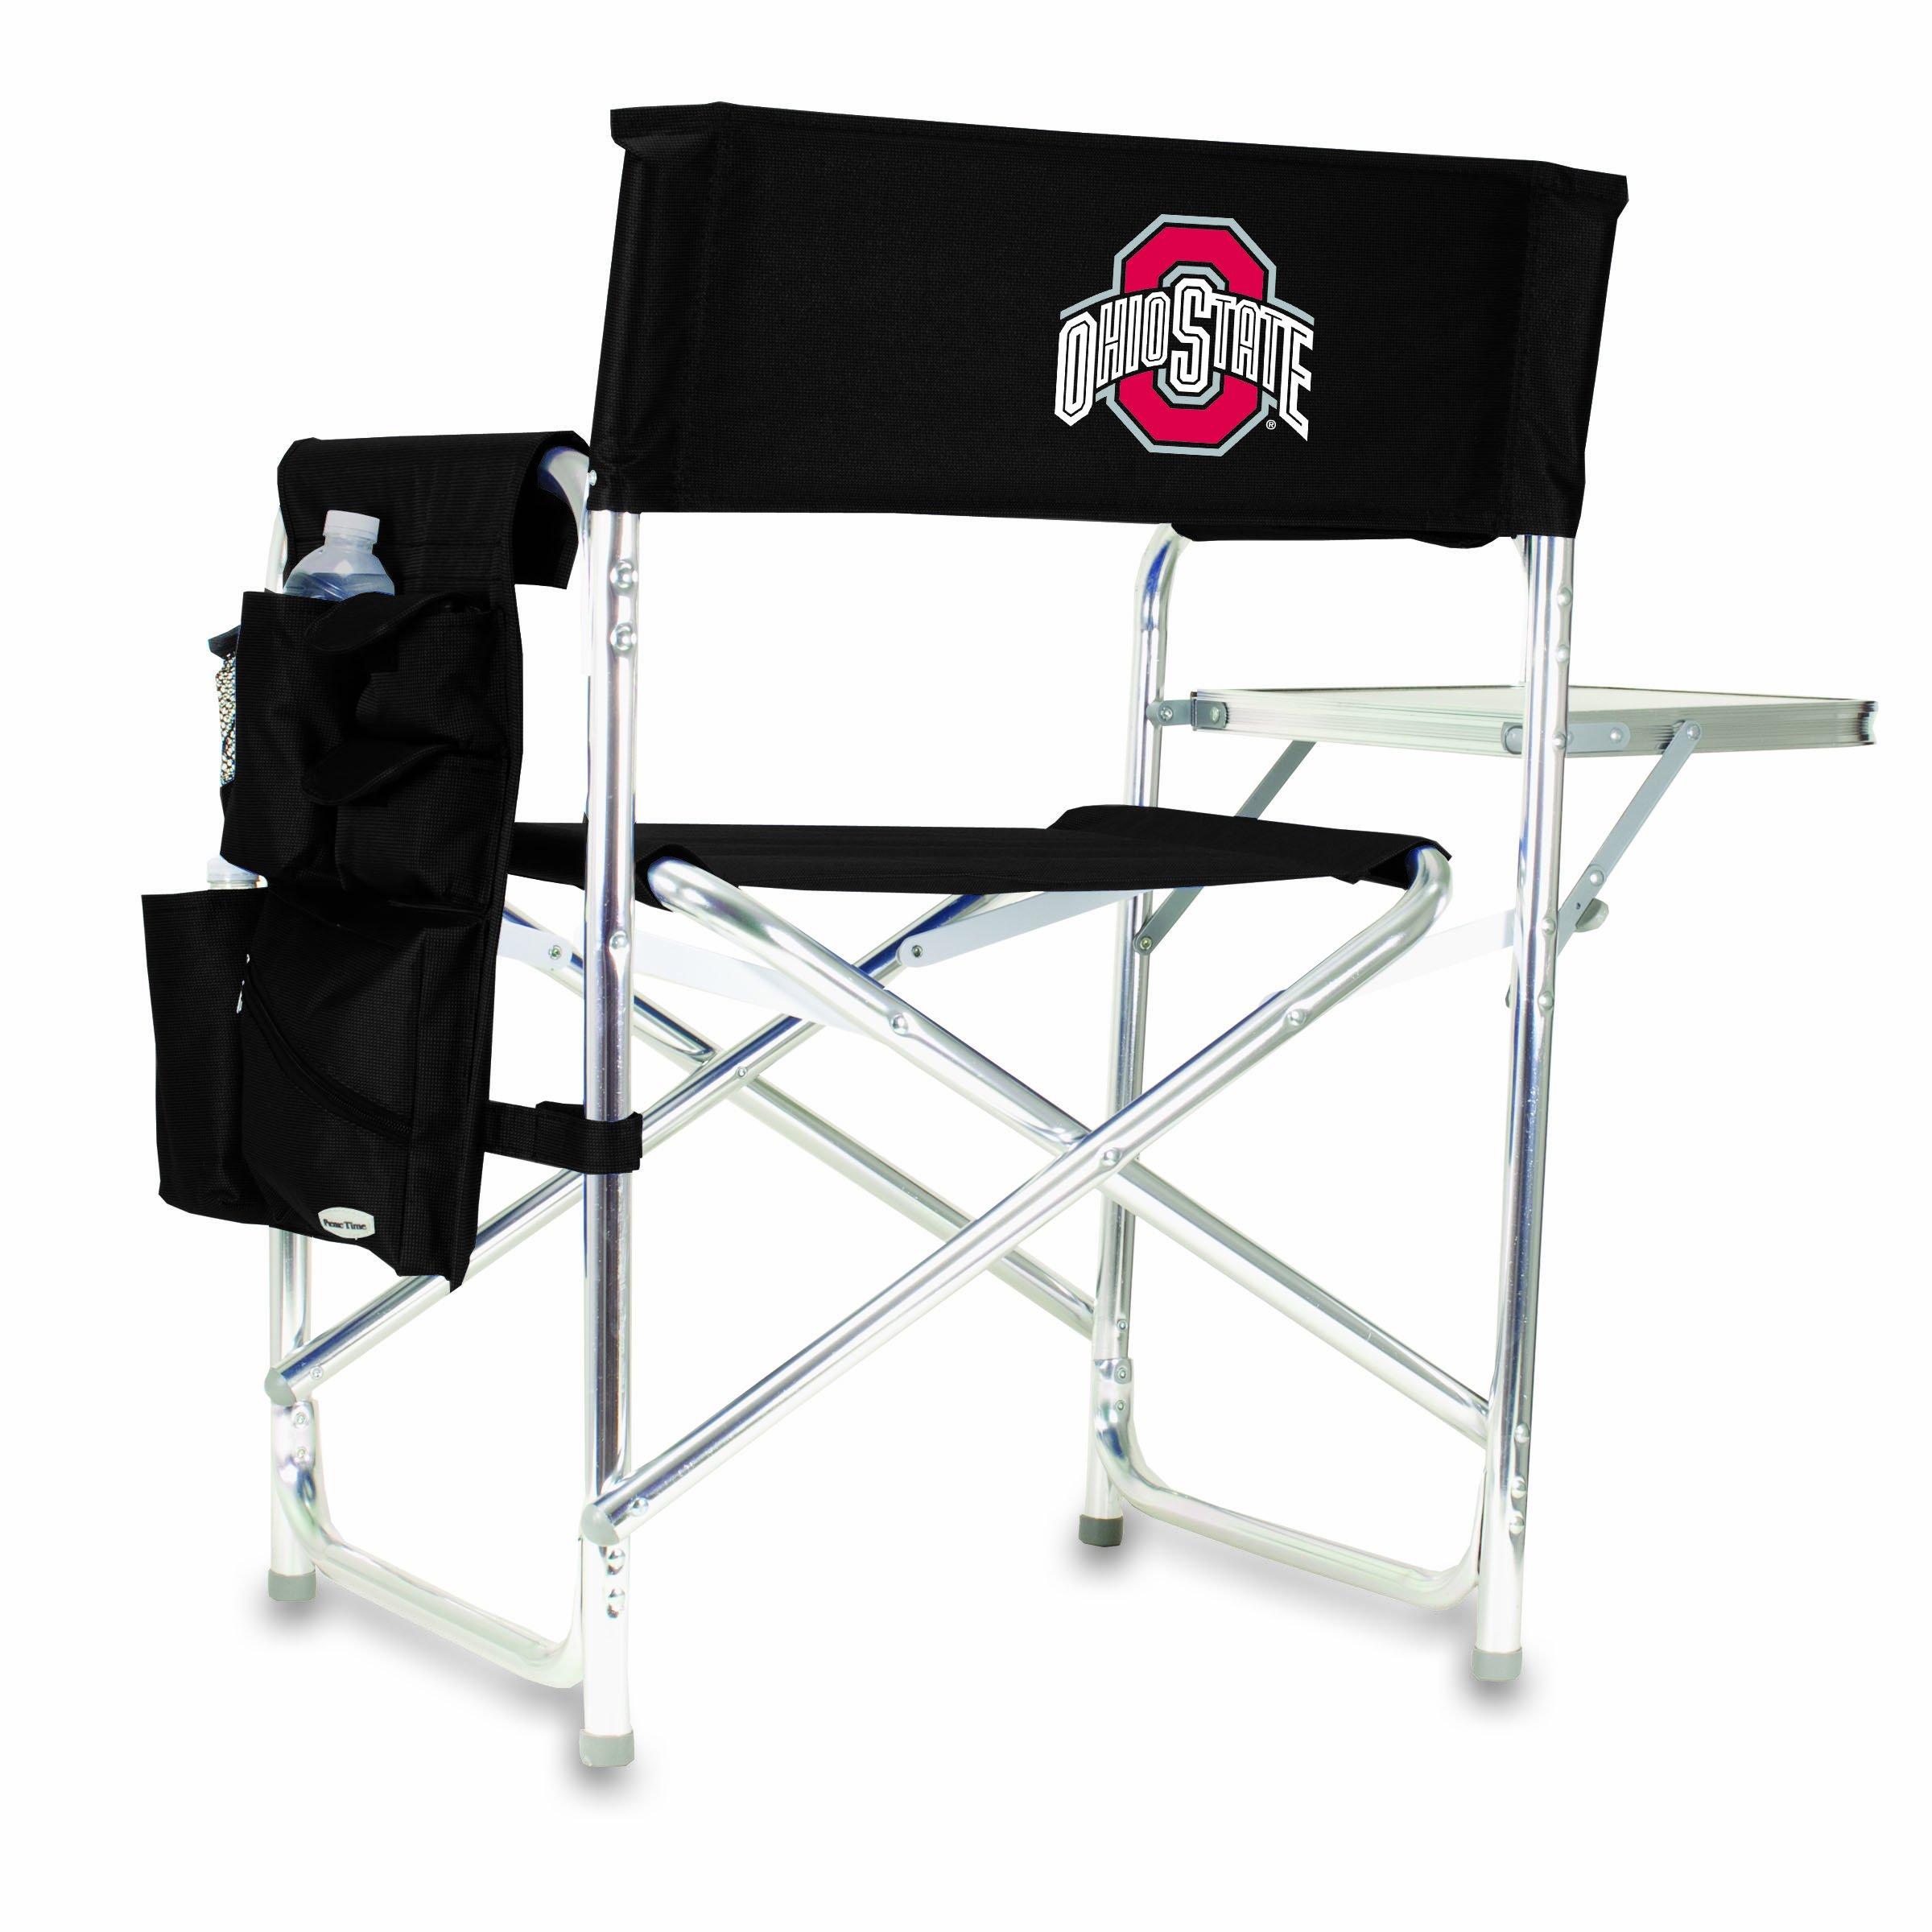 NCAA Ohio State Buckeyes Portable Folding Sports Chair, Black